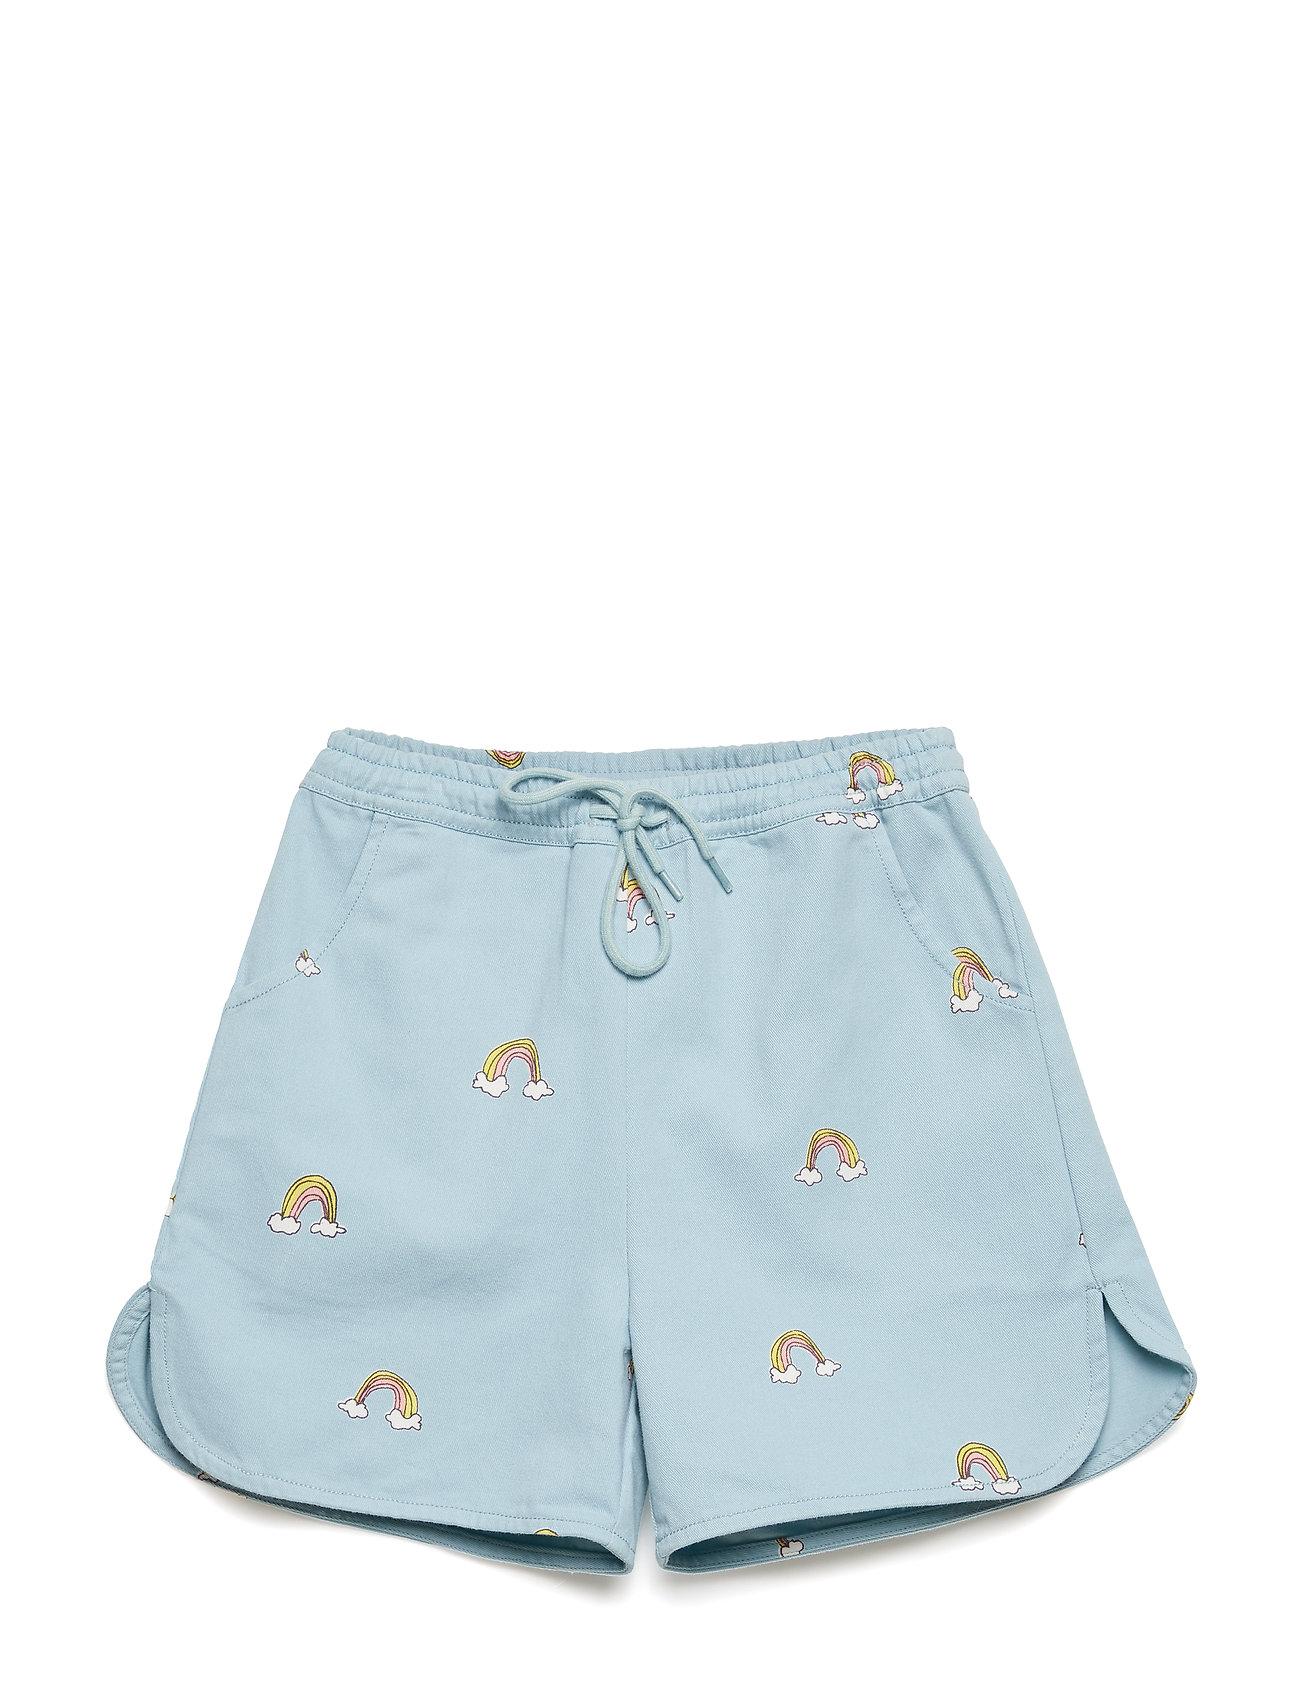 Soft Gallery Devy Shorts - CLOUD BLUE, AOP LUCKY SIMPLE